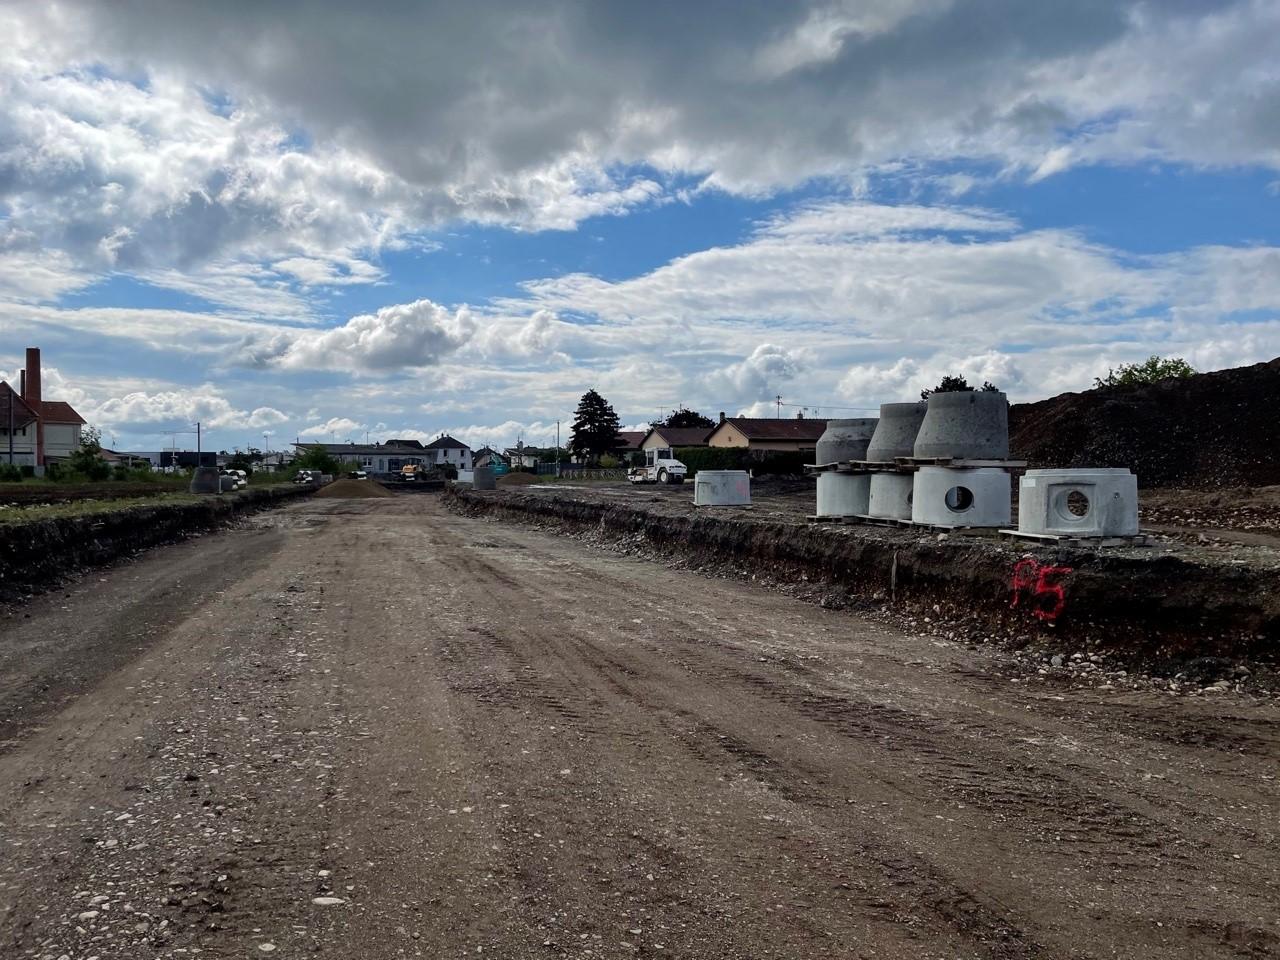 lotissement-terre-deline-terre-et-developpement-cernay-travaux